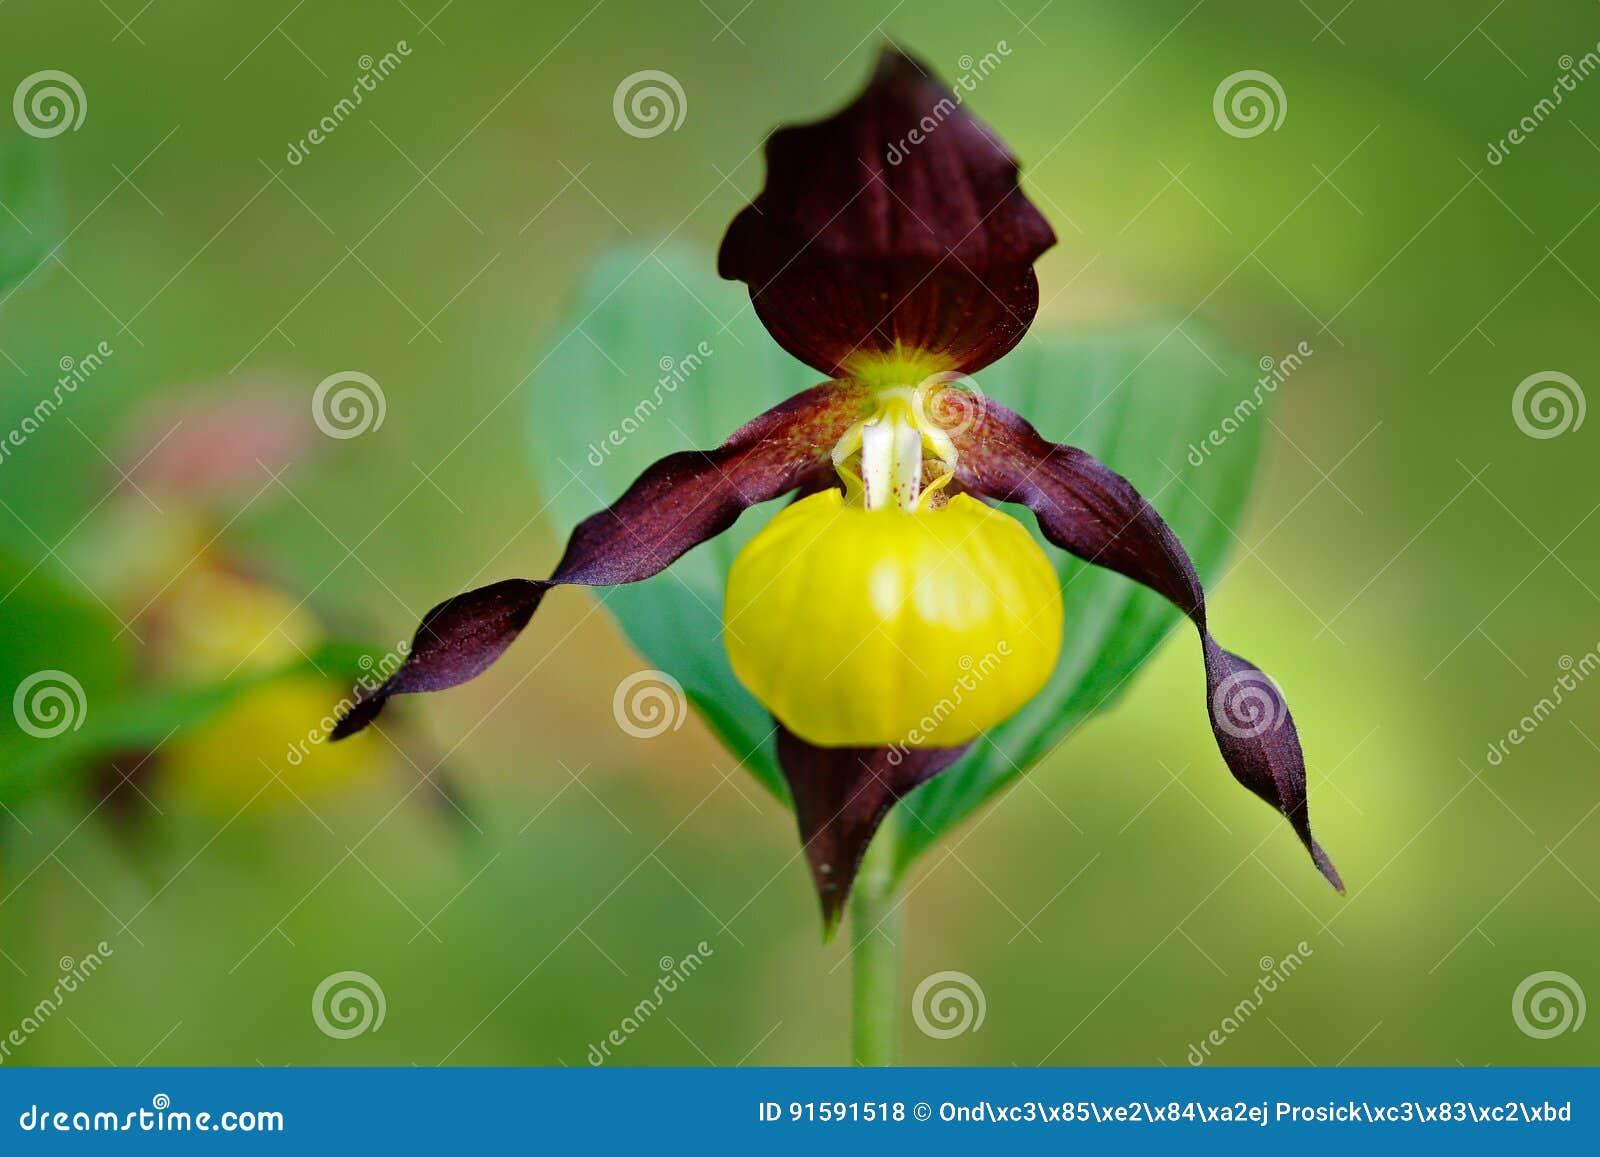 Lady`s Slipper Orchid, Cypripedium calceolus, flowering European terrestrial wild orchid, nature habitat, detail of bloom, green c